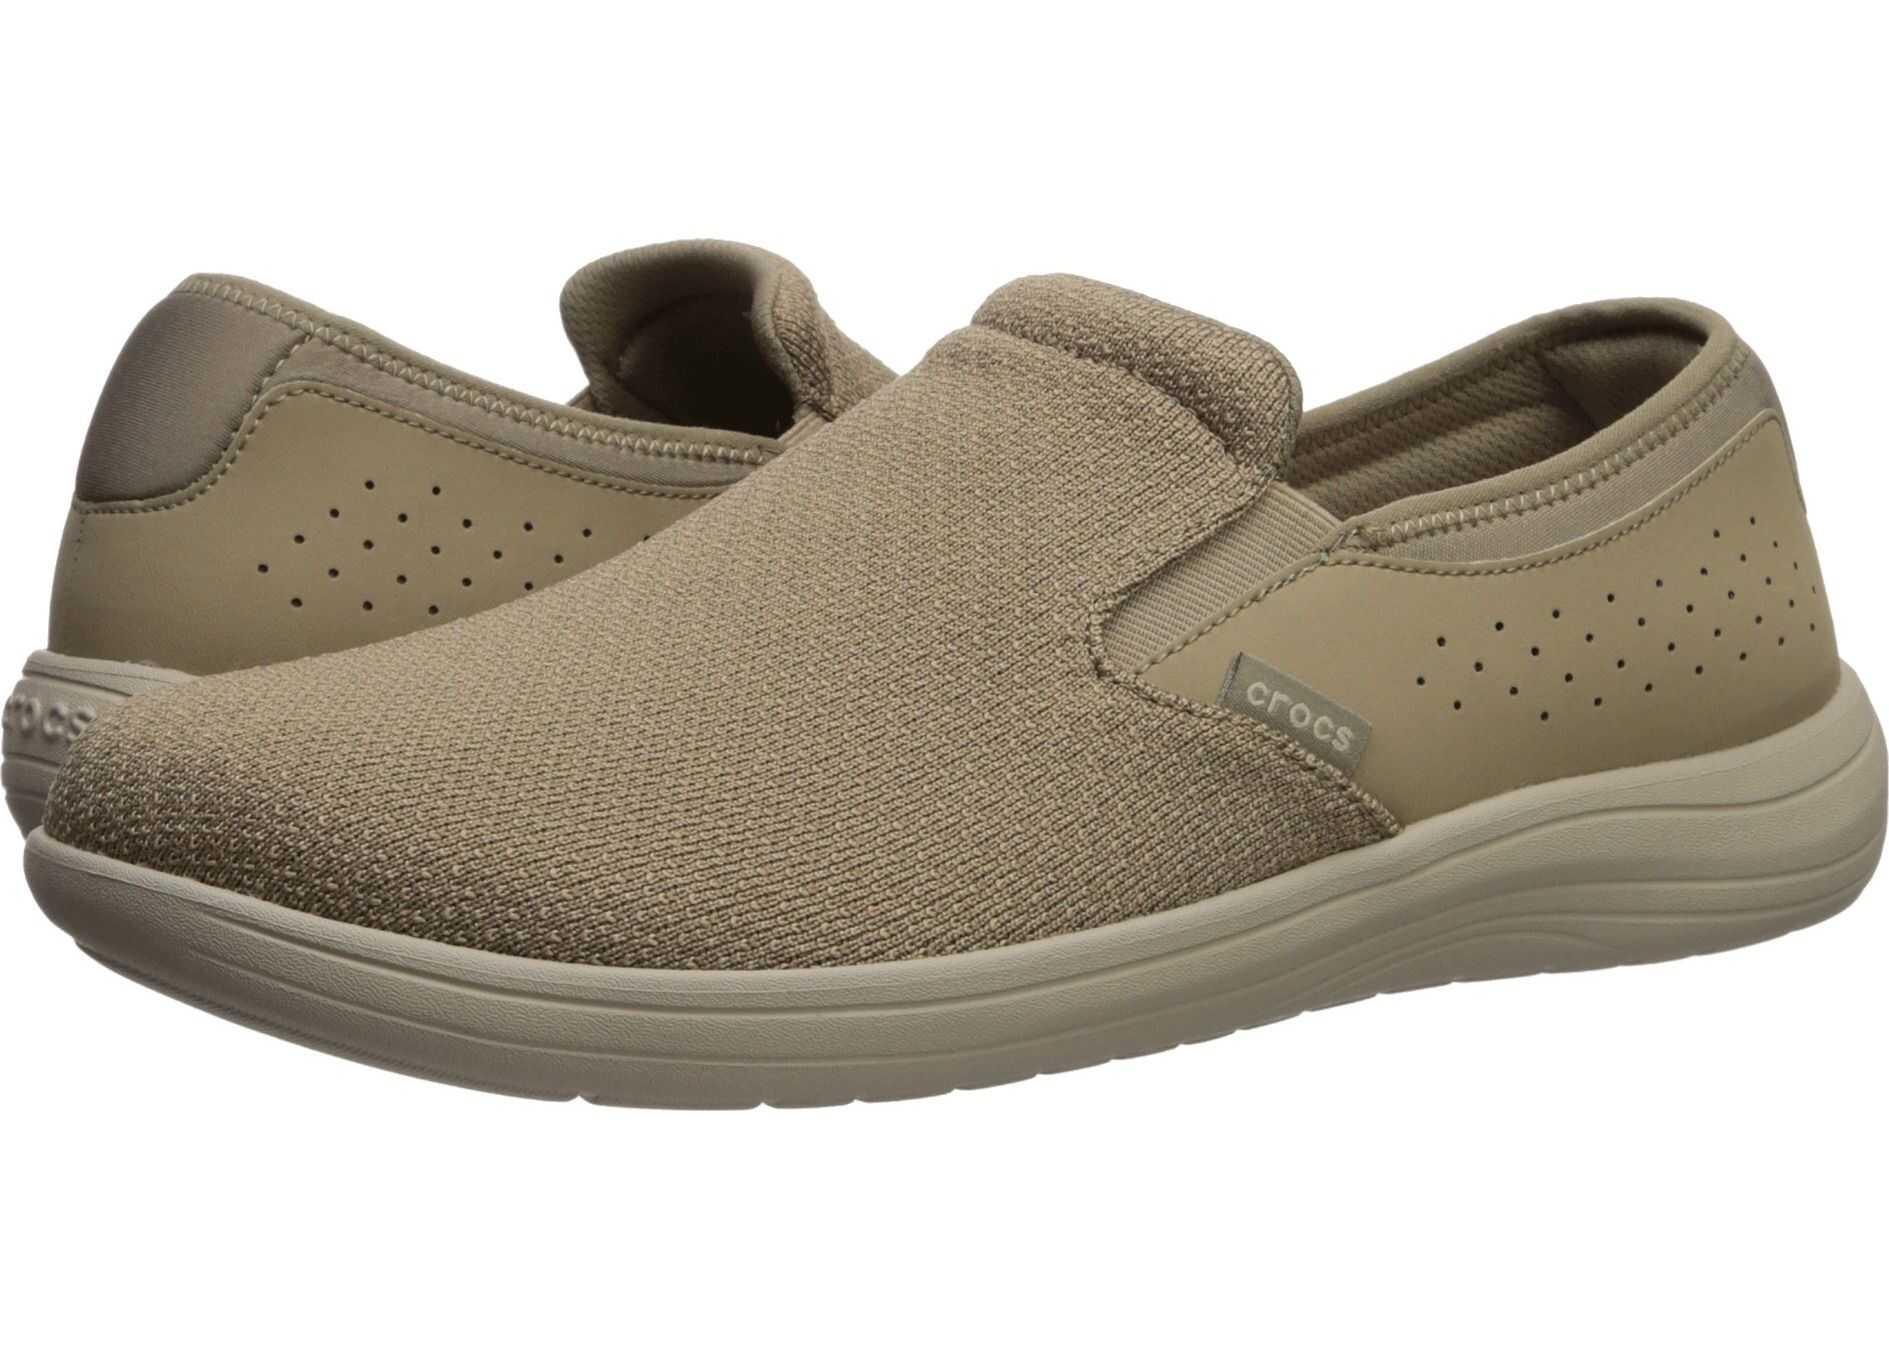 Crocs Reviva Slip-On Khaki/Cobblestone